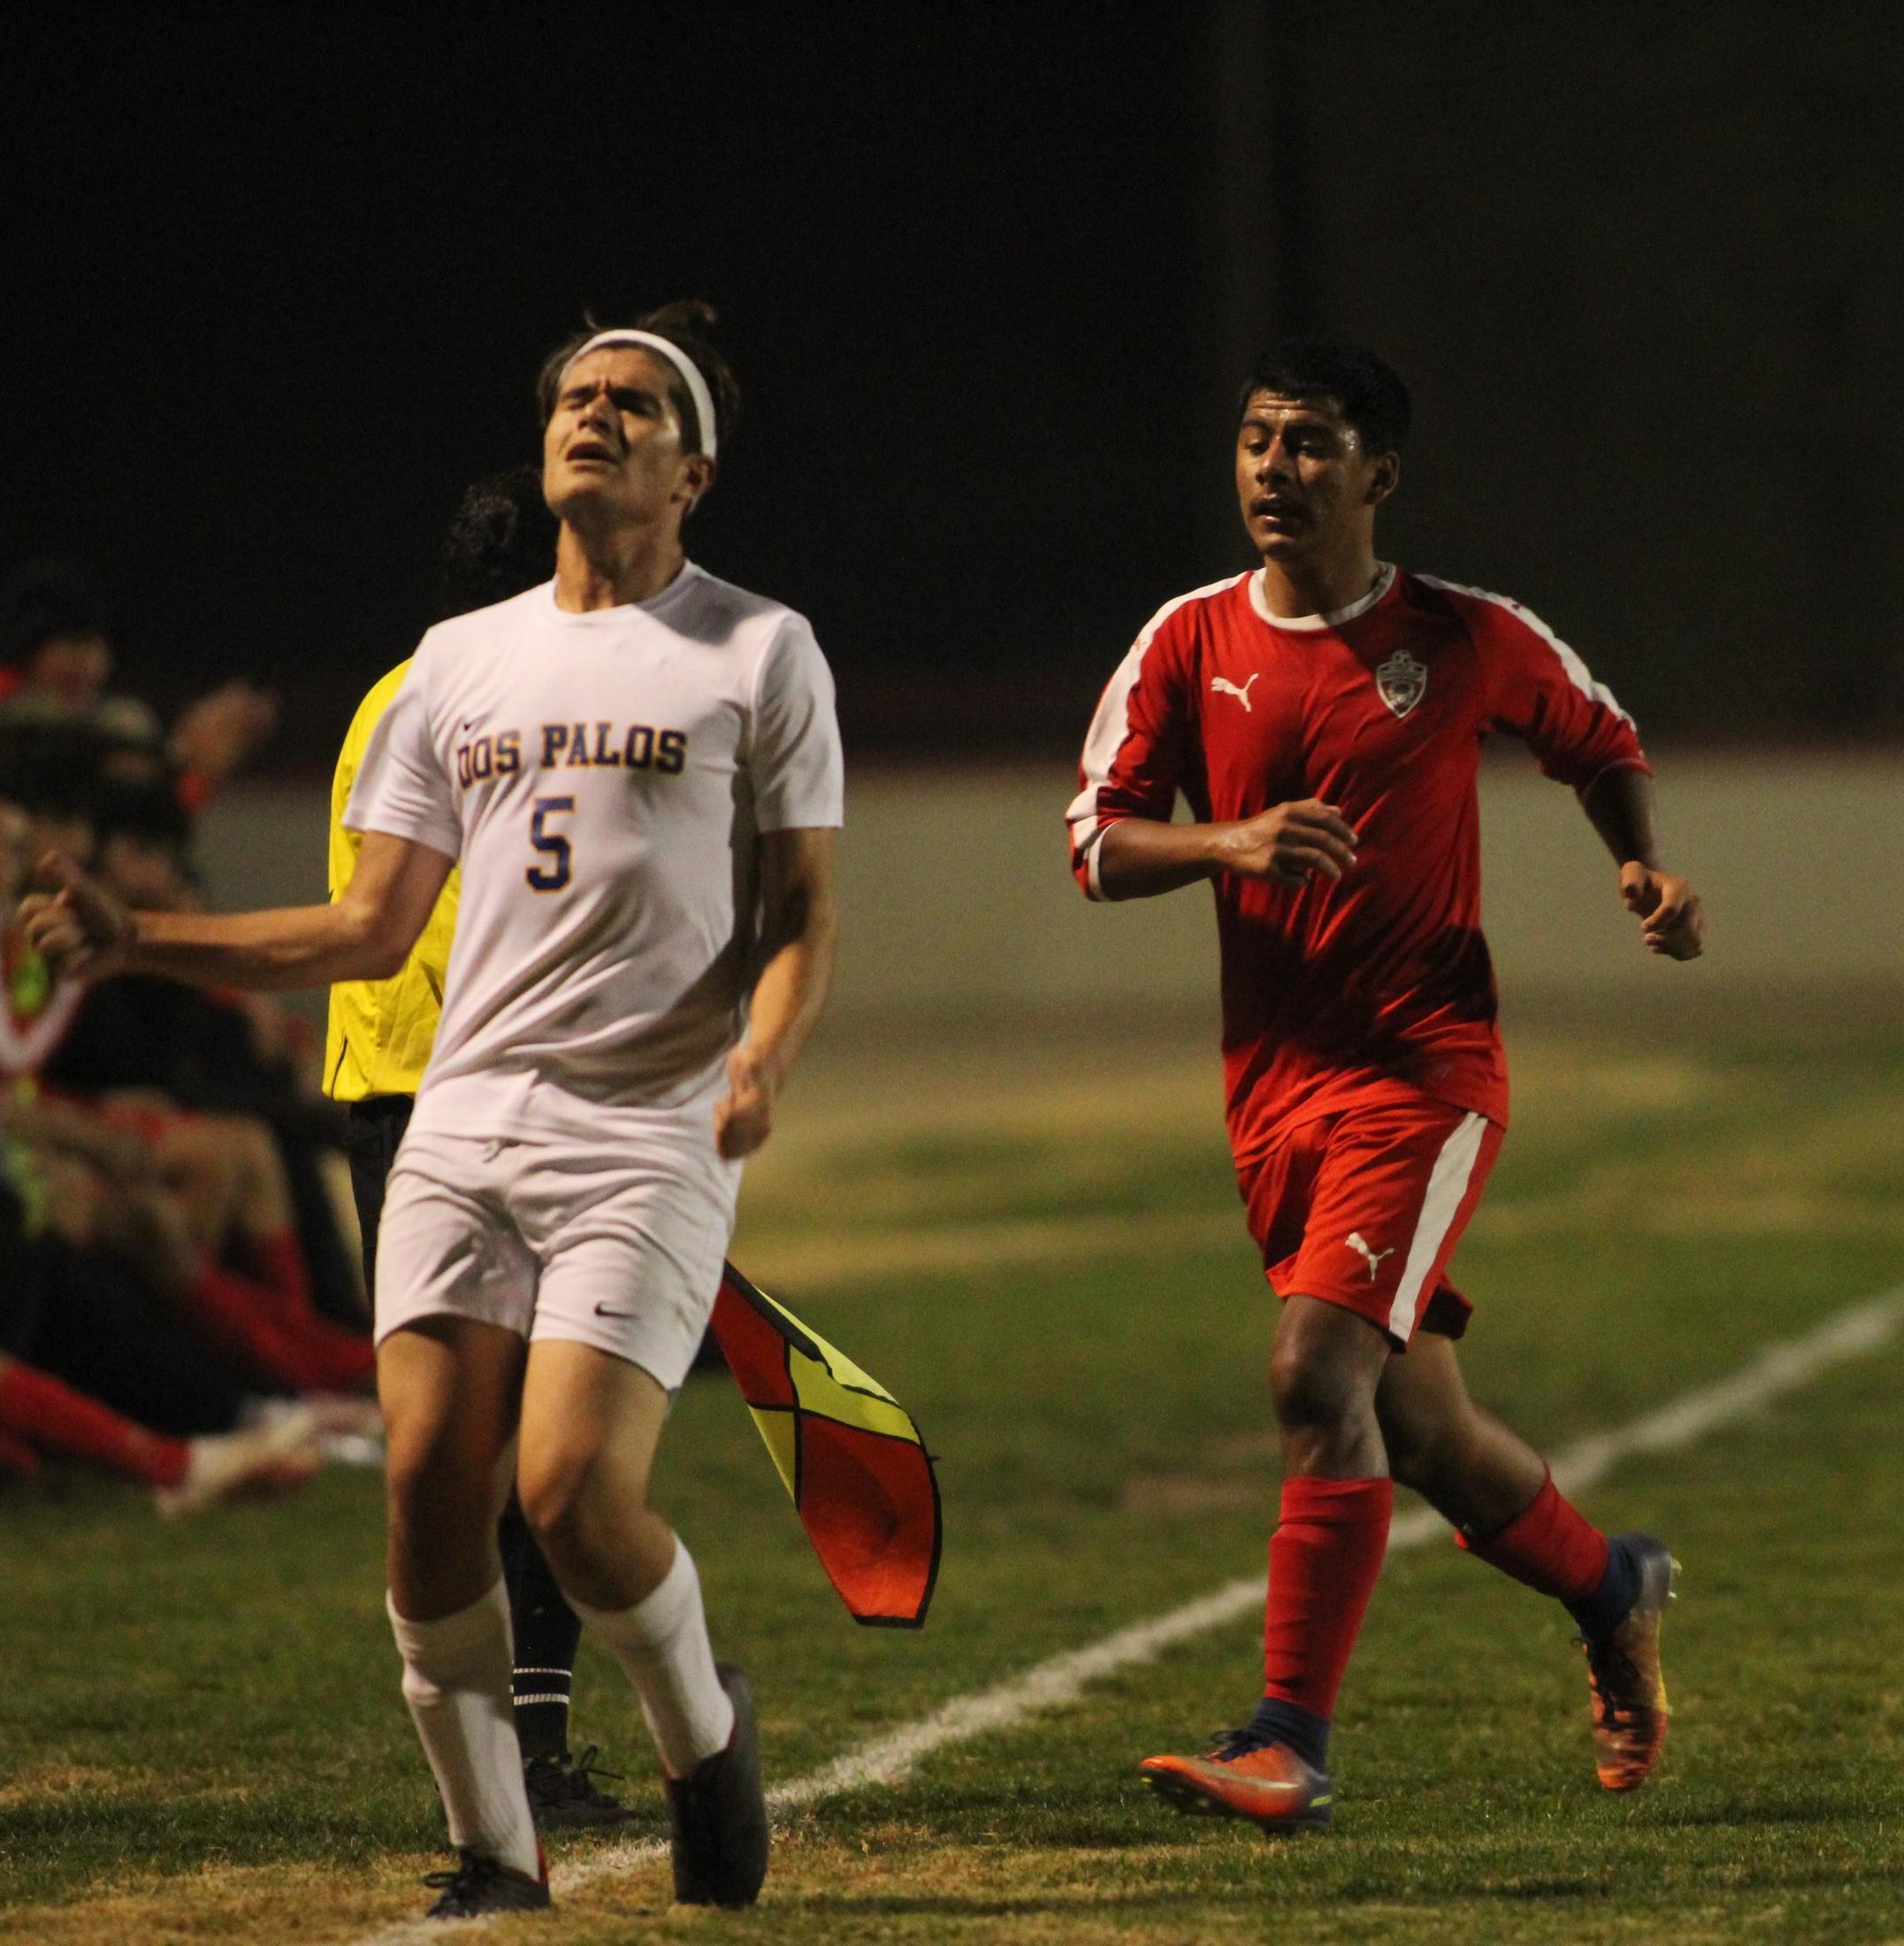 Cristobal Galvan kicking the ball